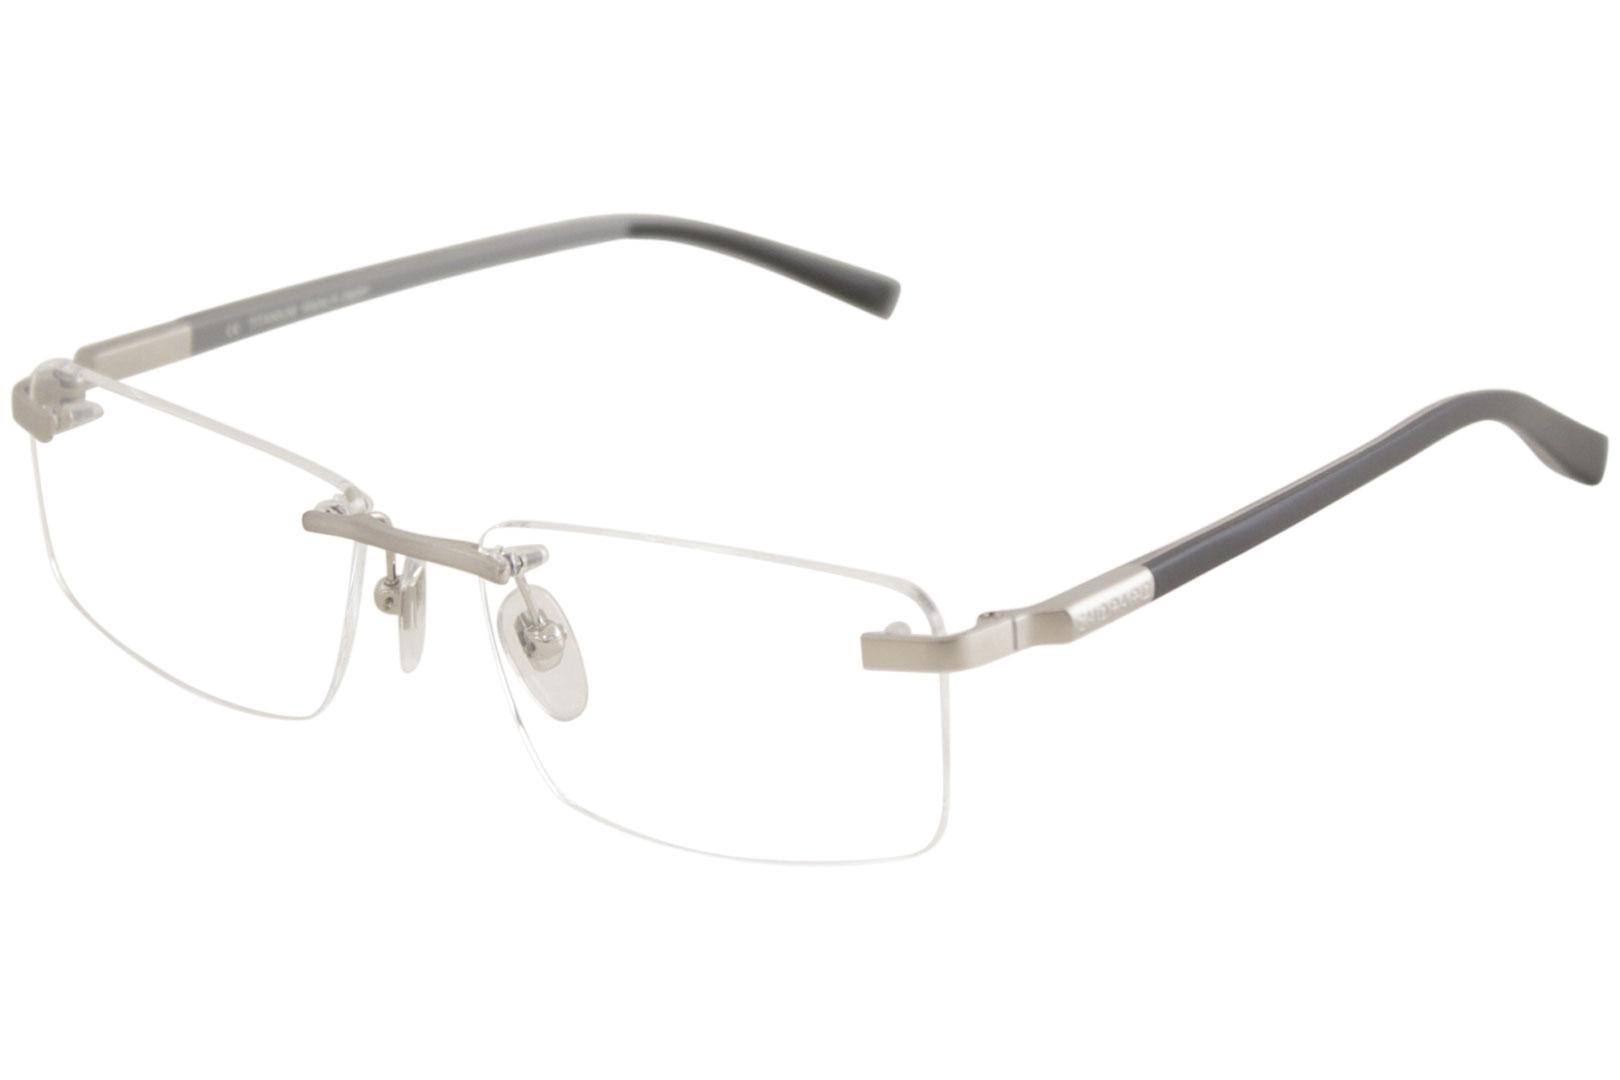 3f39b2c74c Chopard Eyeglasses VCHA08 VCHA 08 0589 Shiny Palladium Optical Frame ...